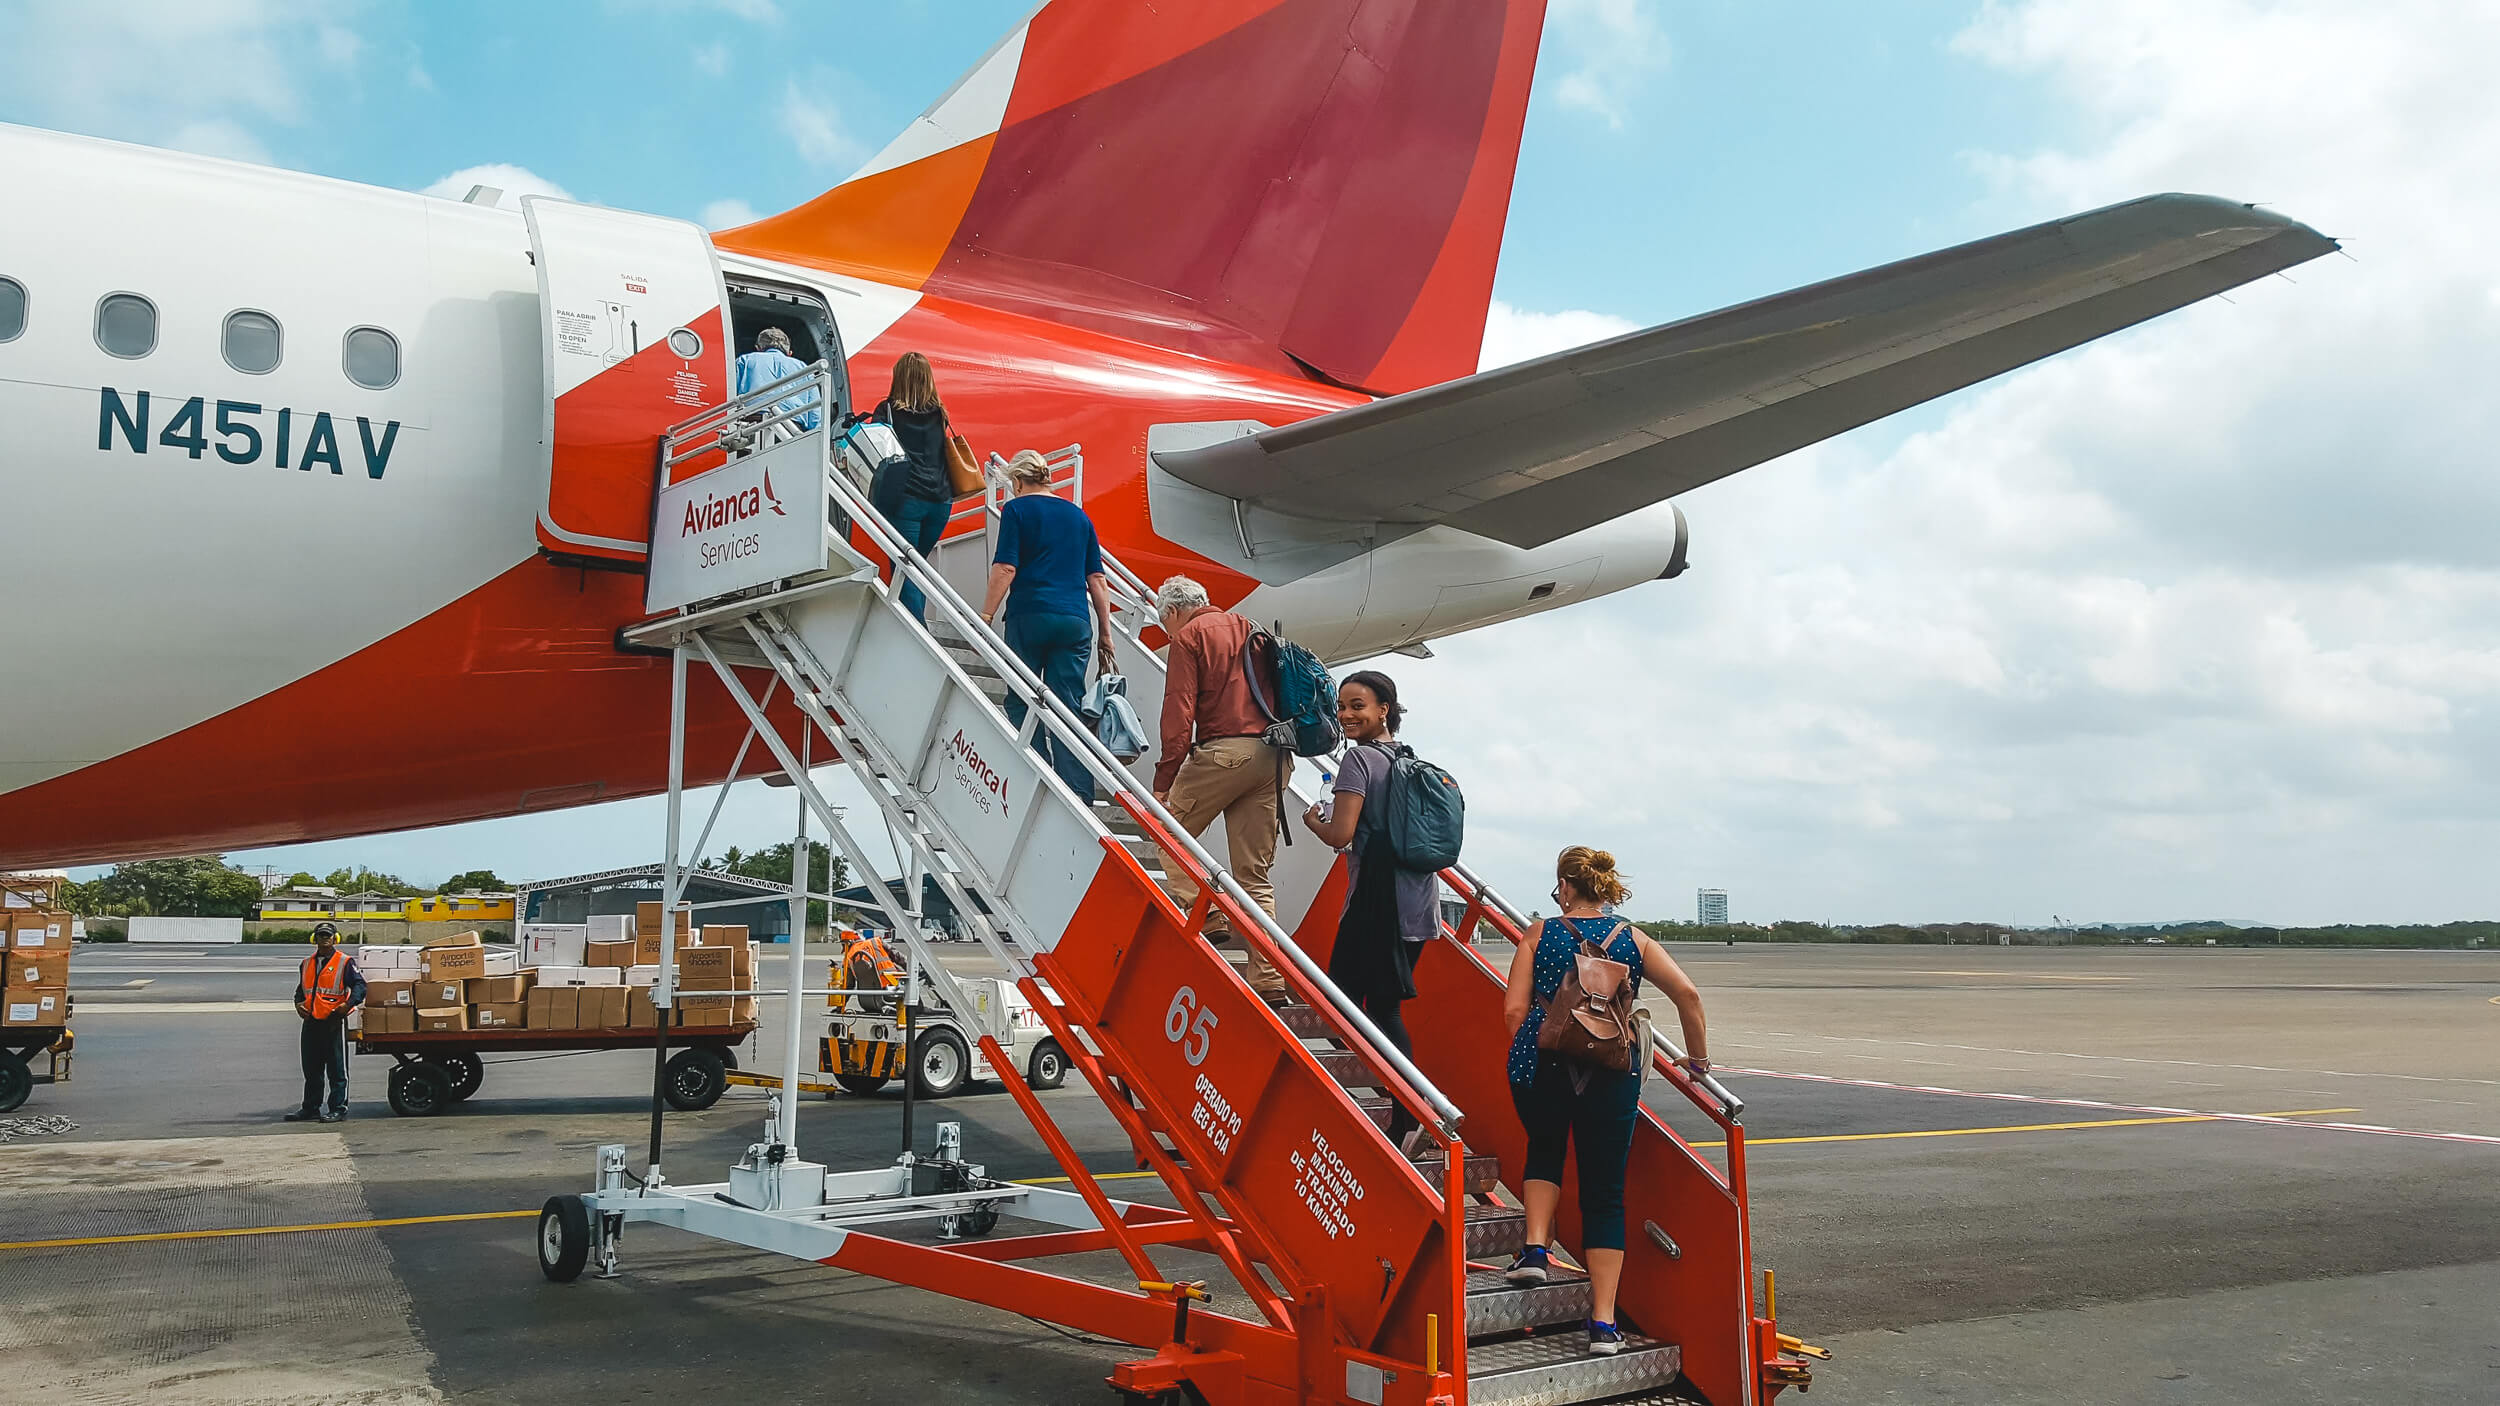 Holiday Travel Tips to Reduce Stress - ochristine